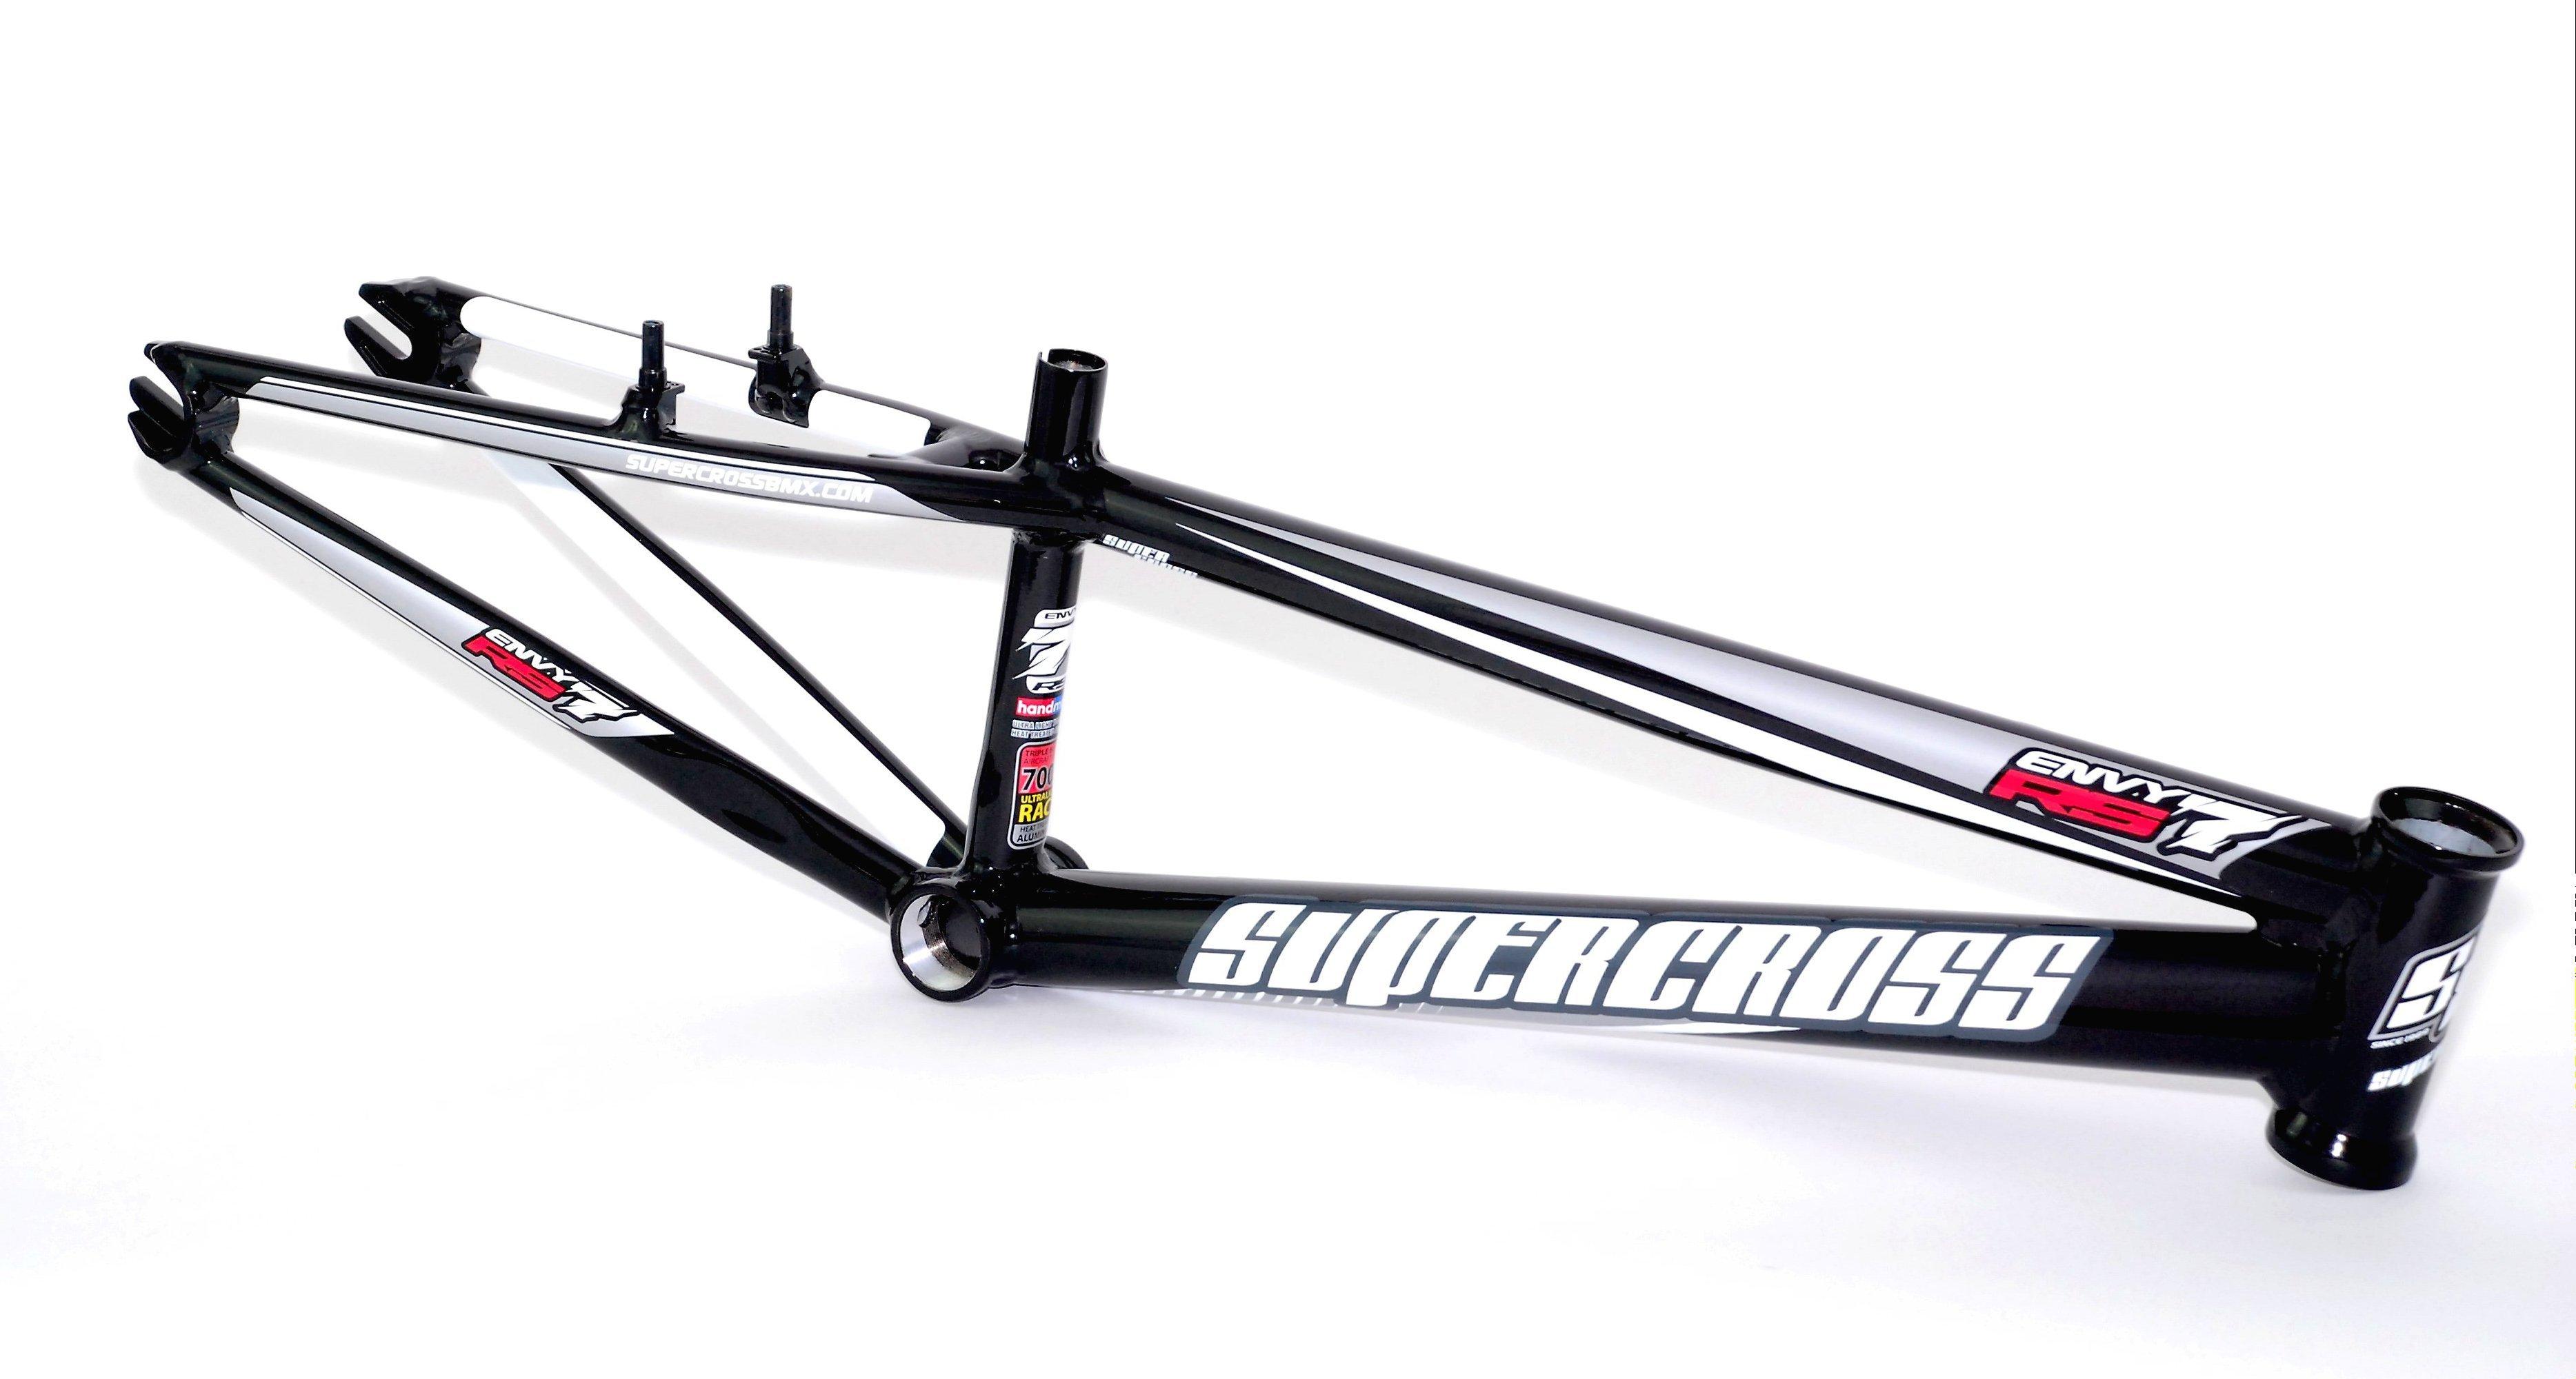 Supercross RS7 BMX Race Frame Gloss Black £649.95